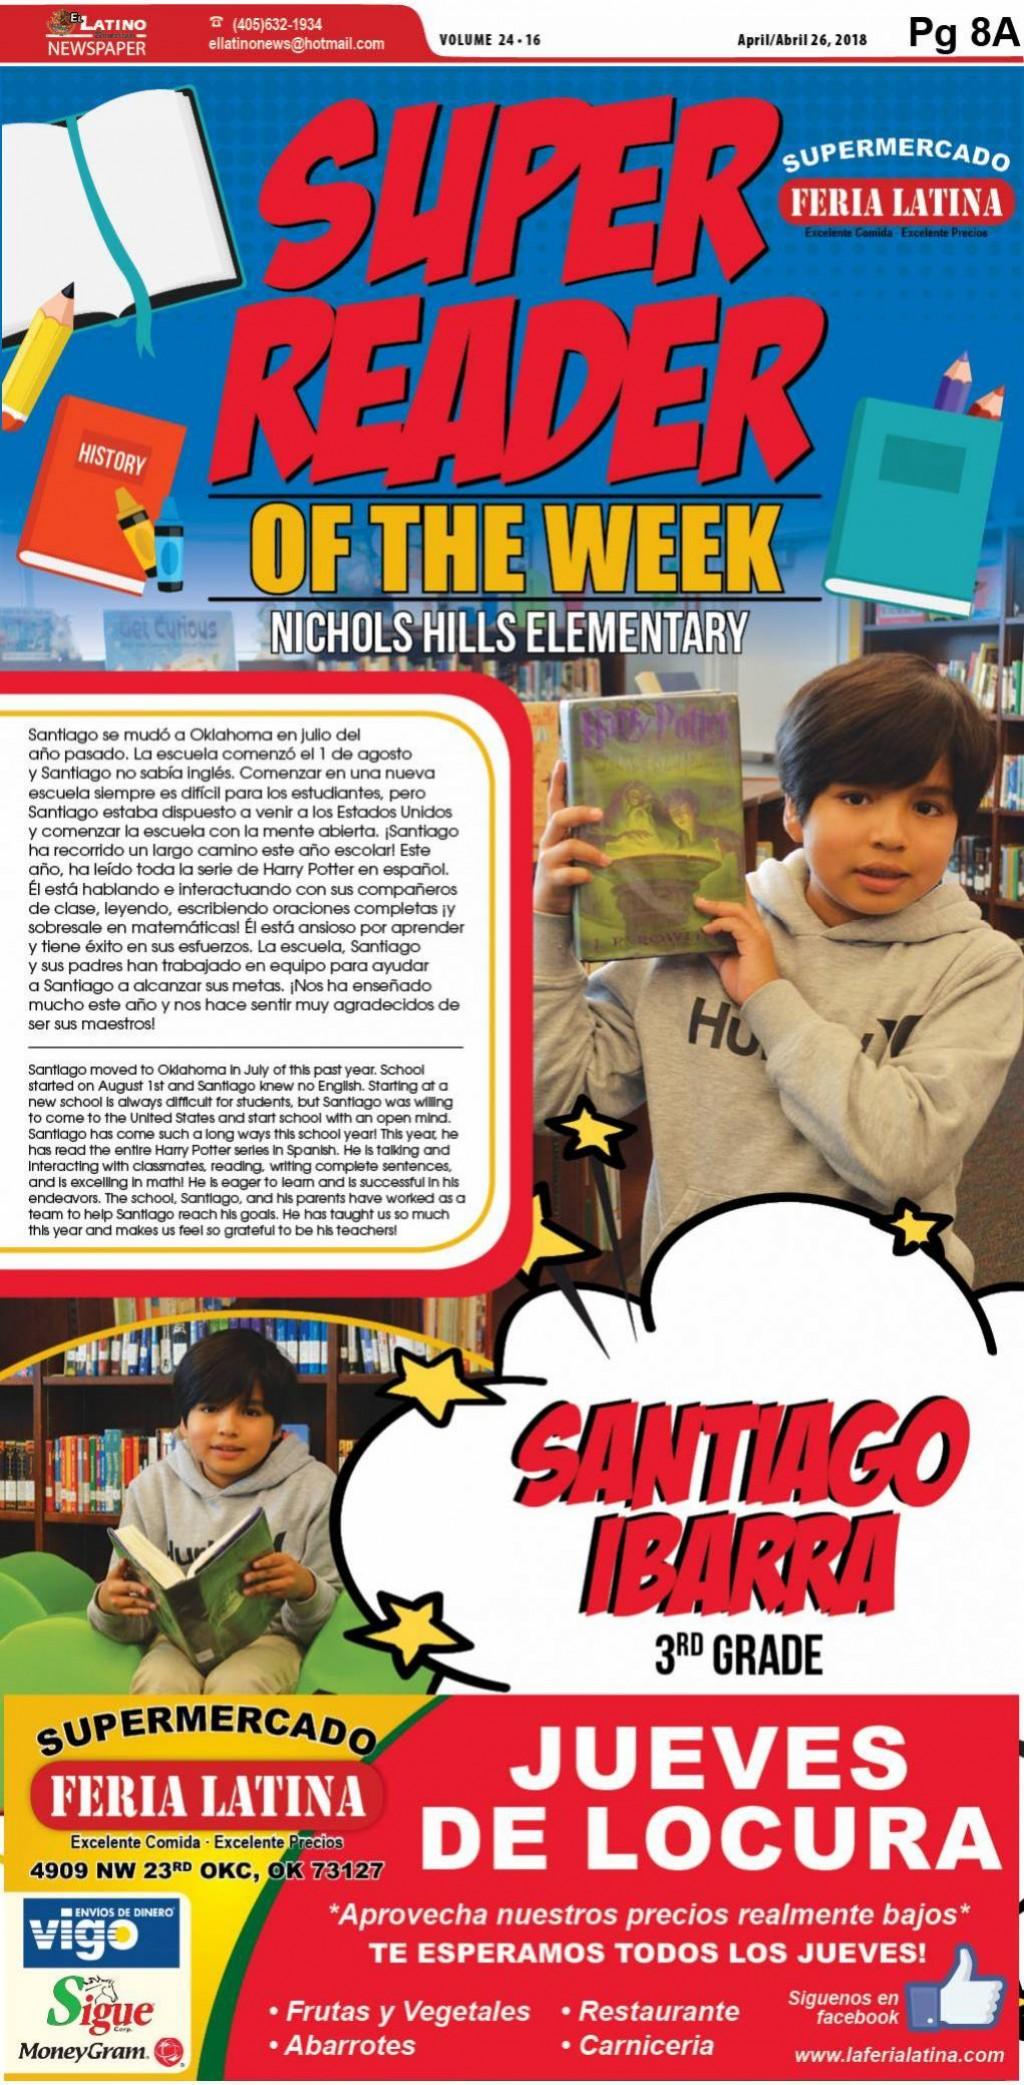 Super Reader of the Week:  Santiago Ibarra